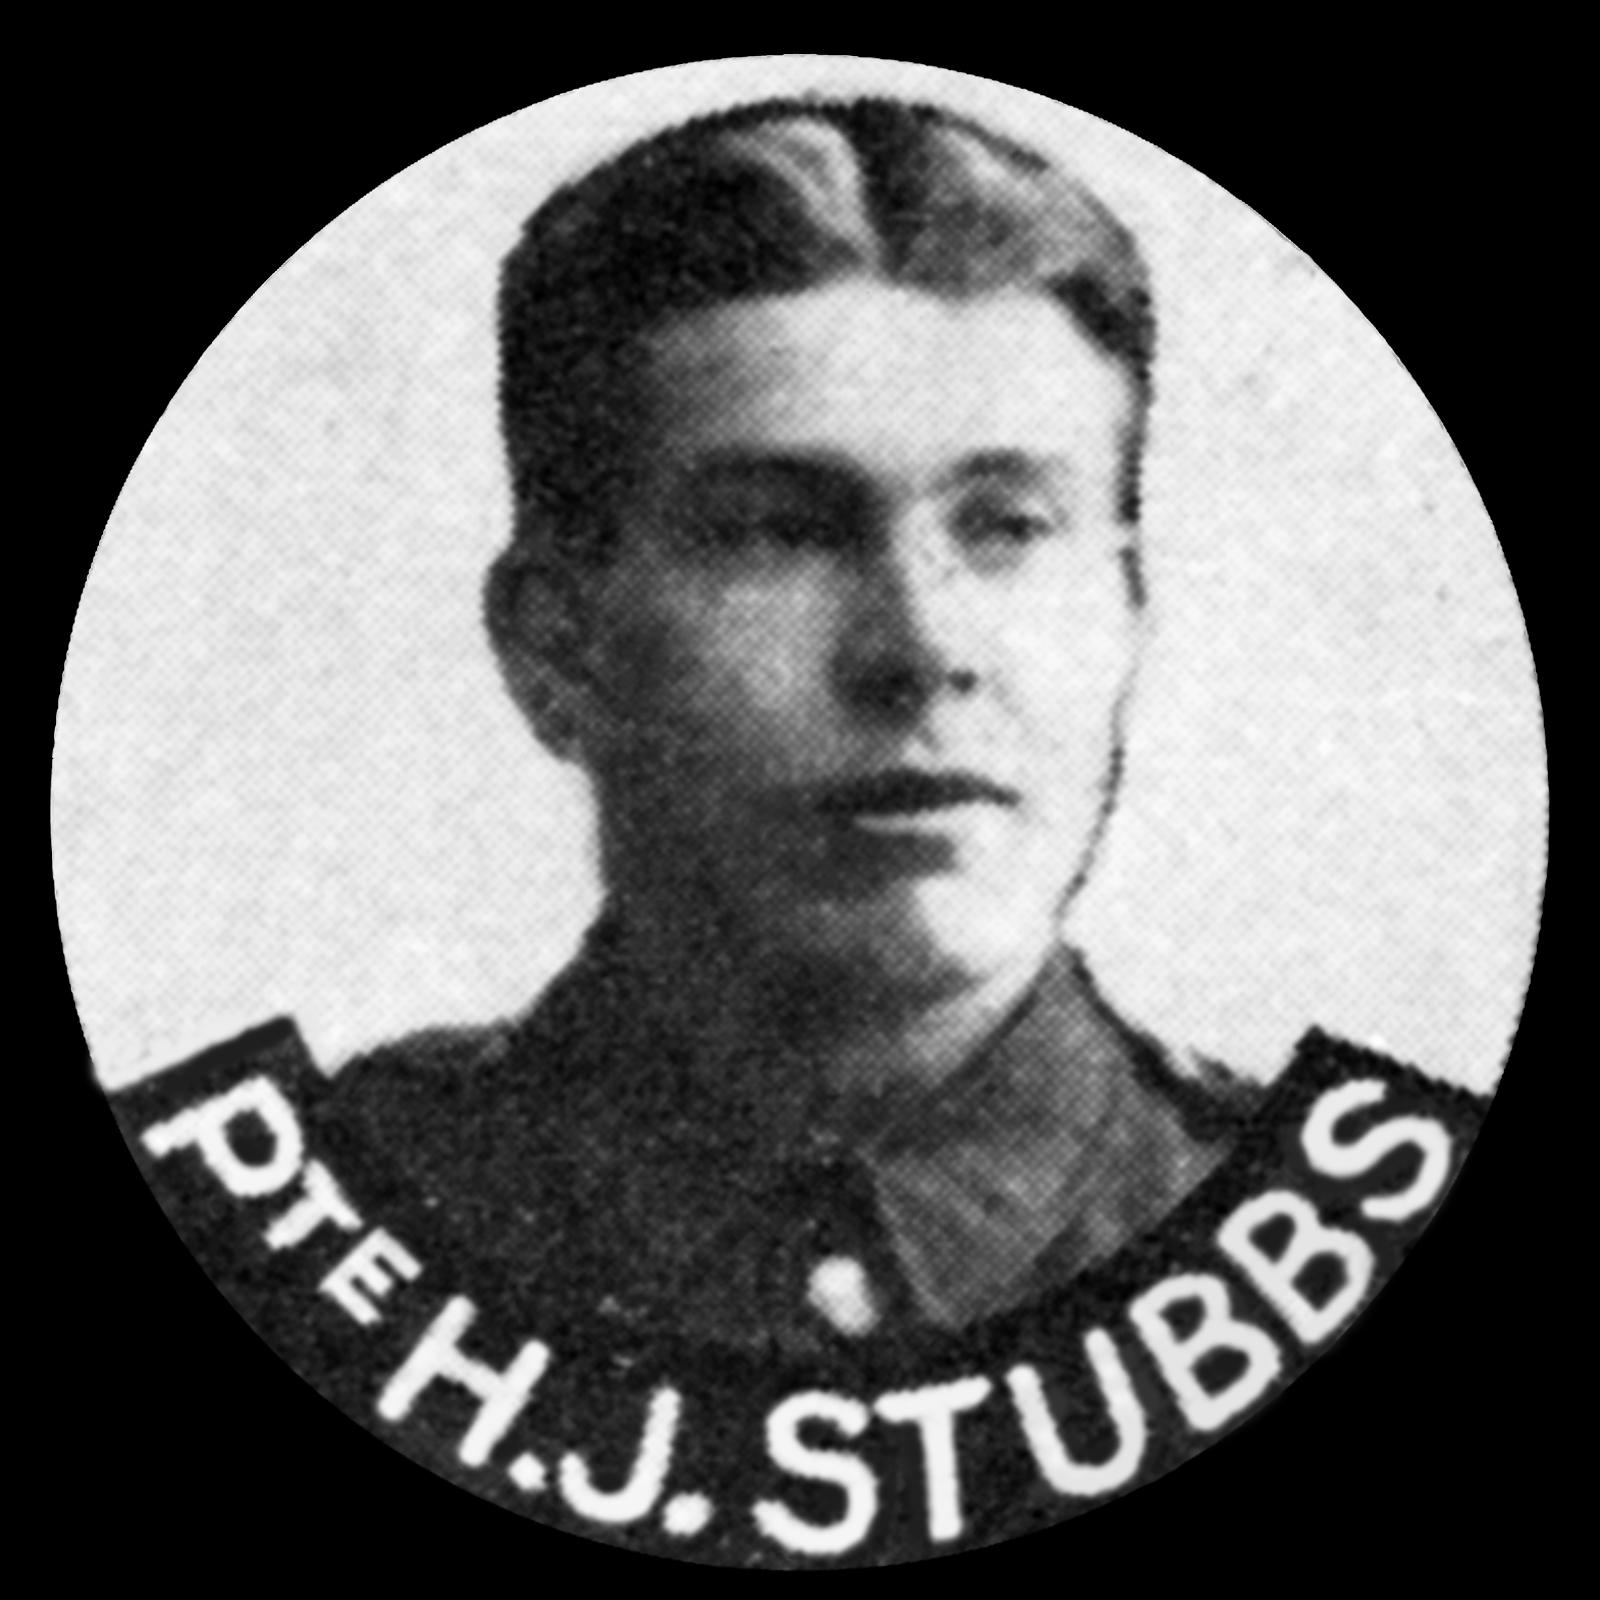 STUBBS Henry Job